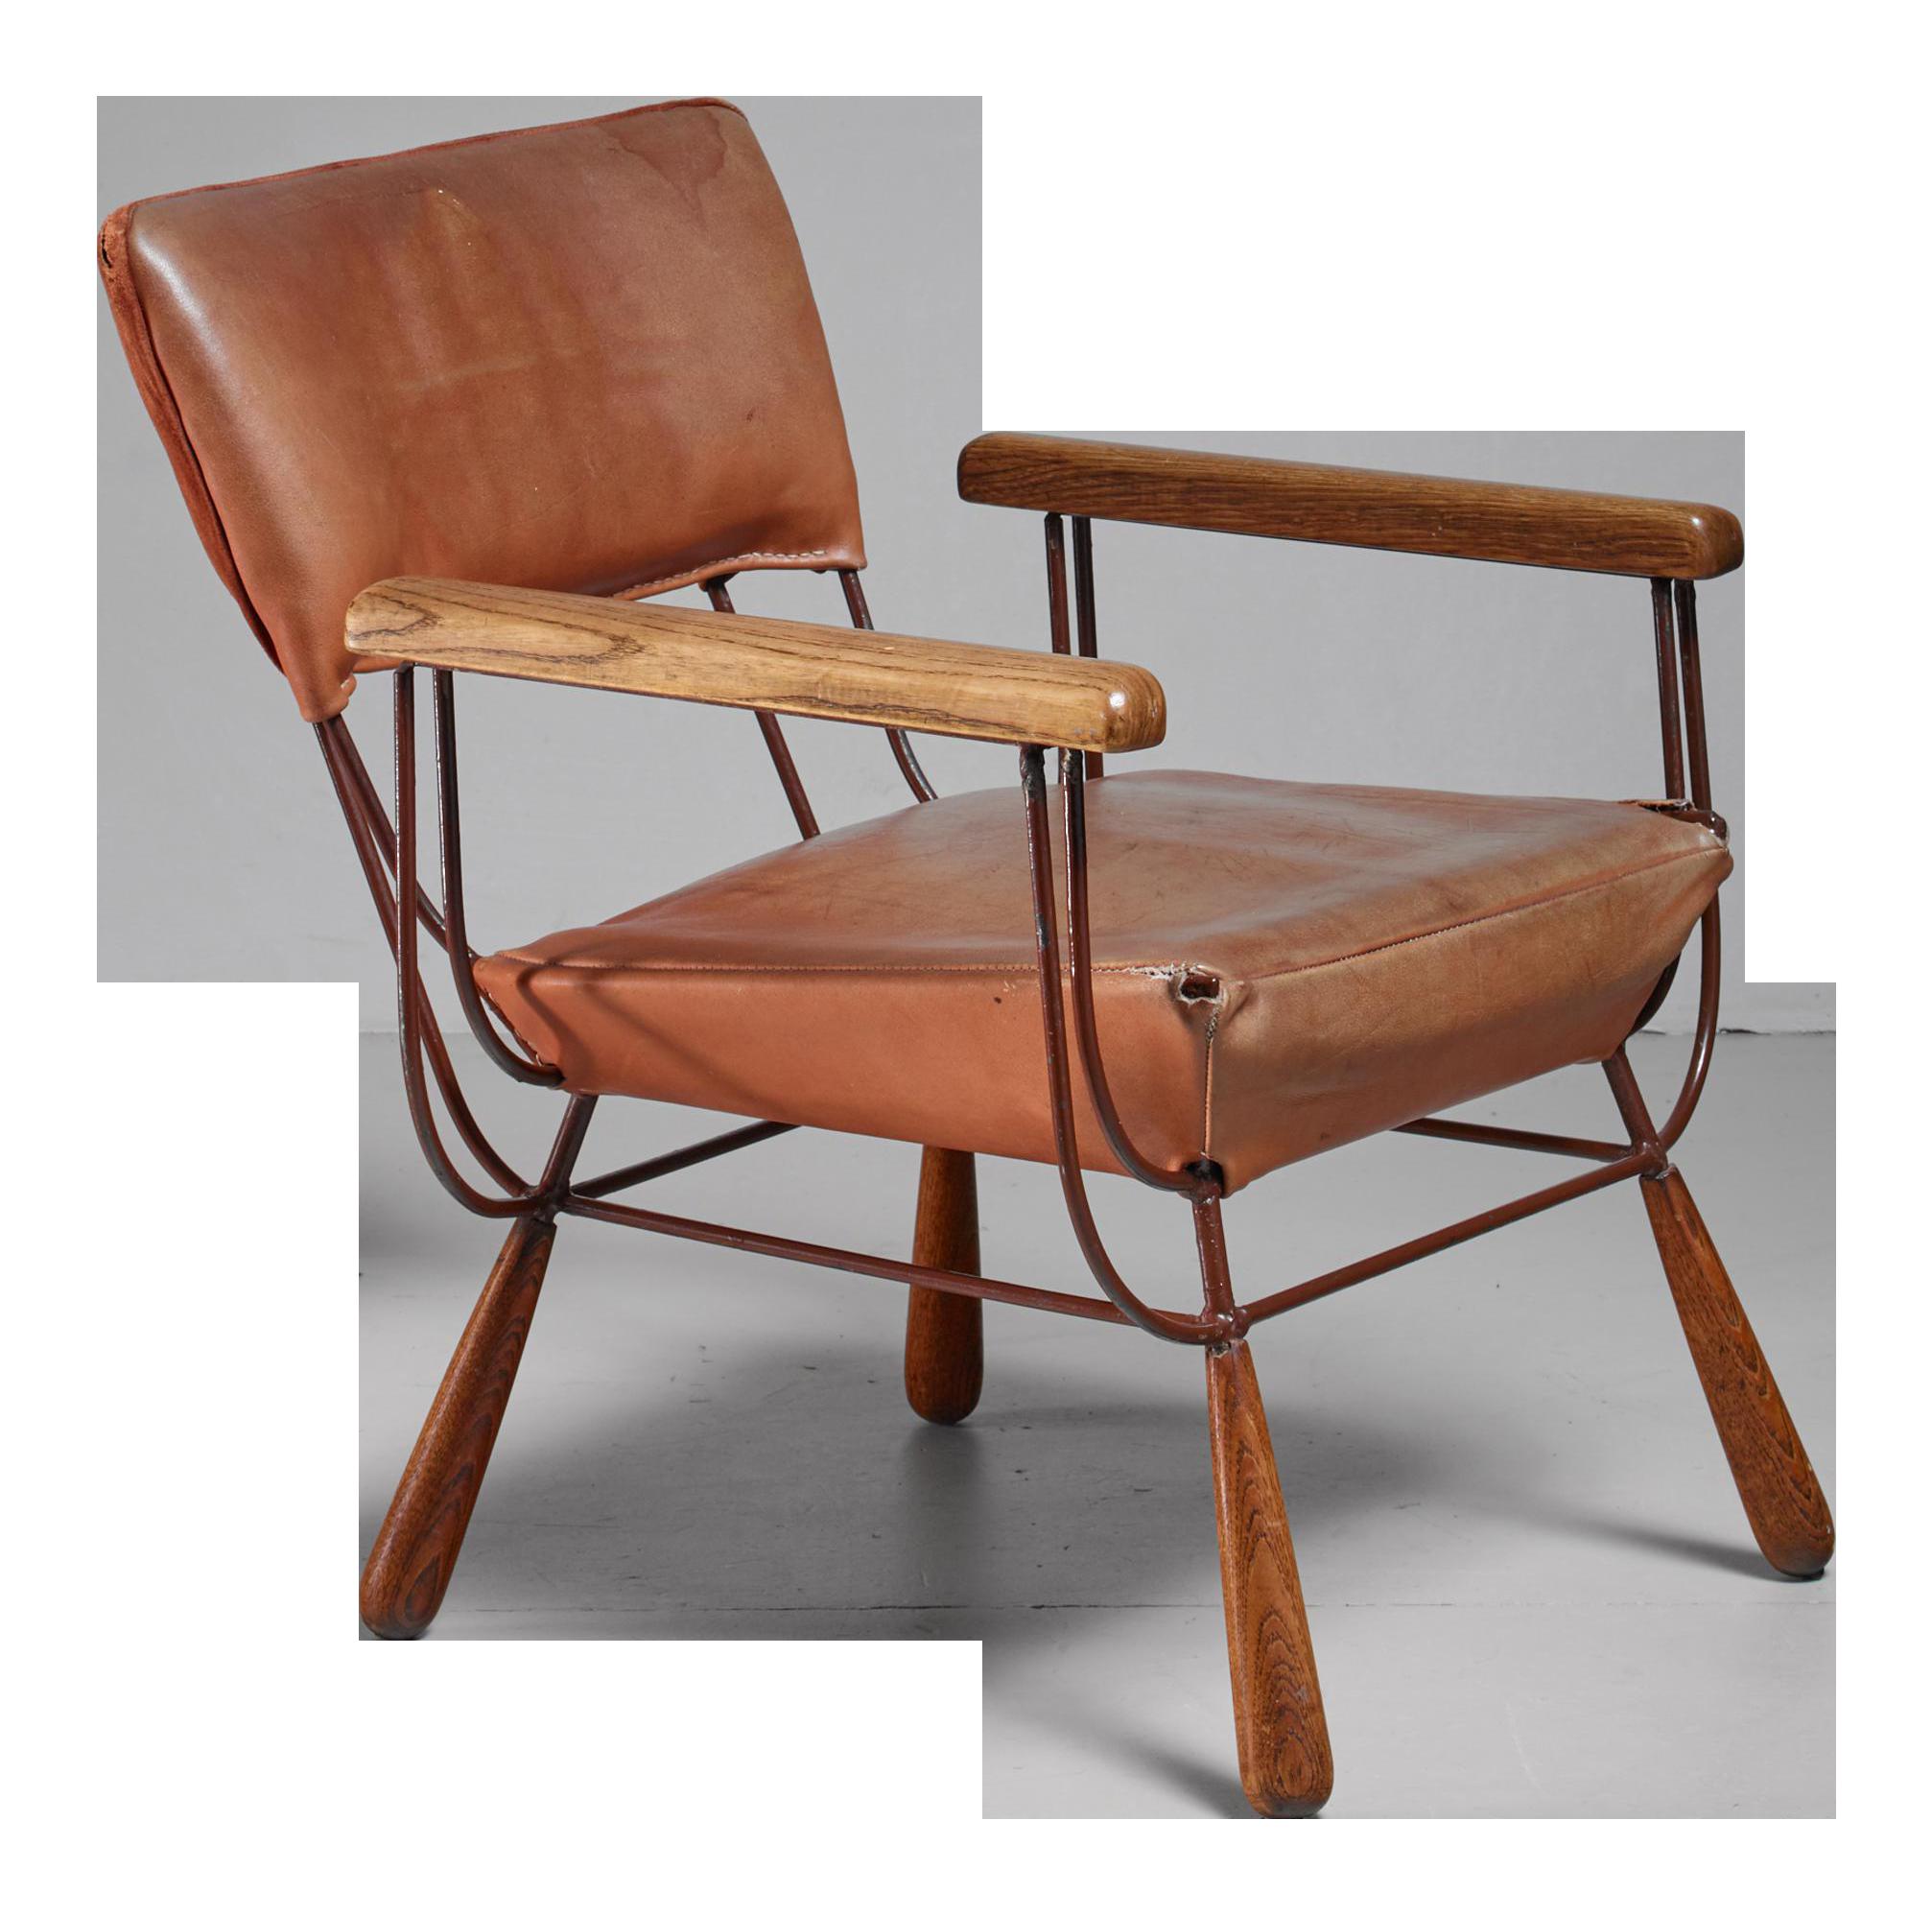 Allen Ditson Unique Lounge Chair, USA, 1960s   Image 1 Of 6